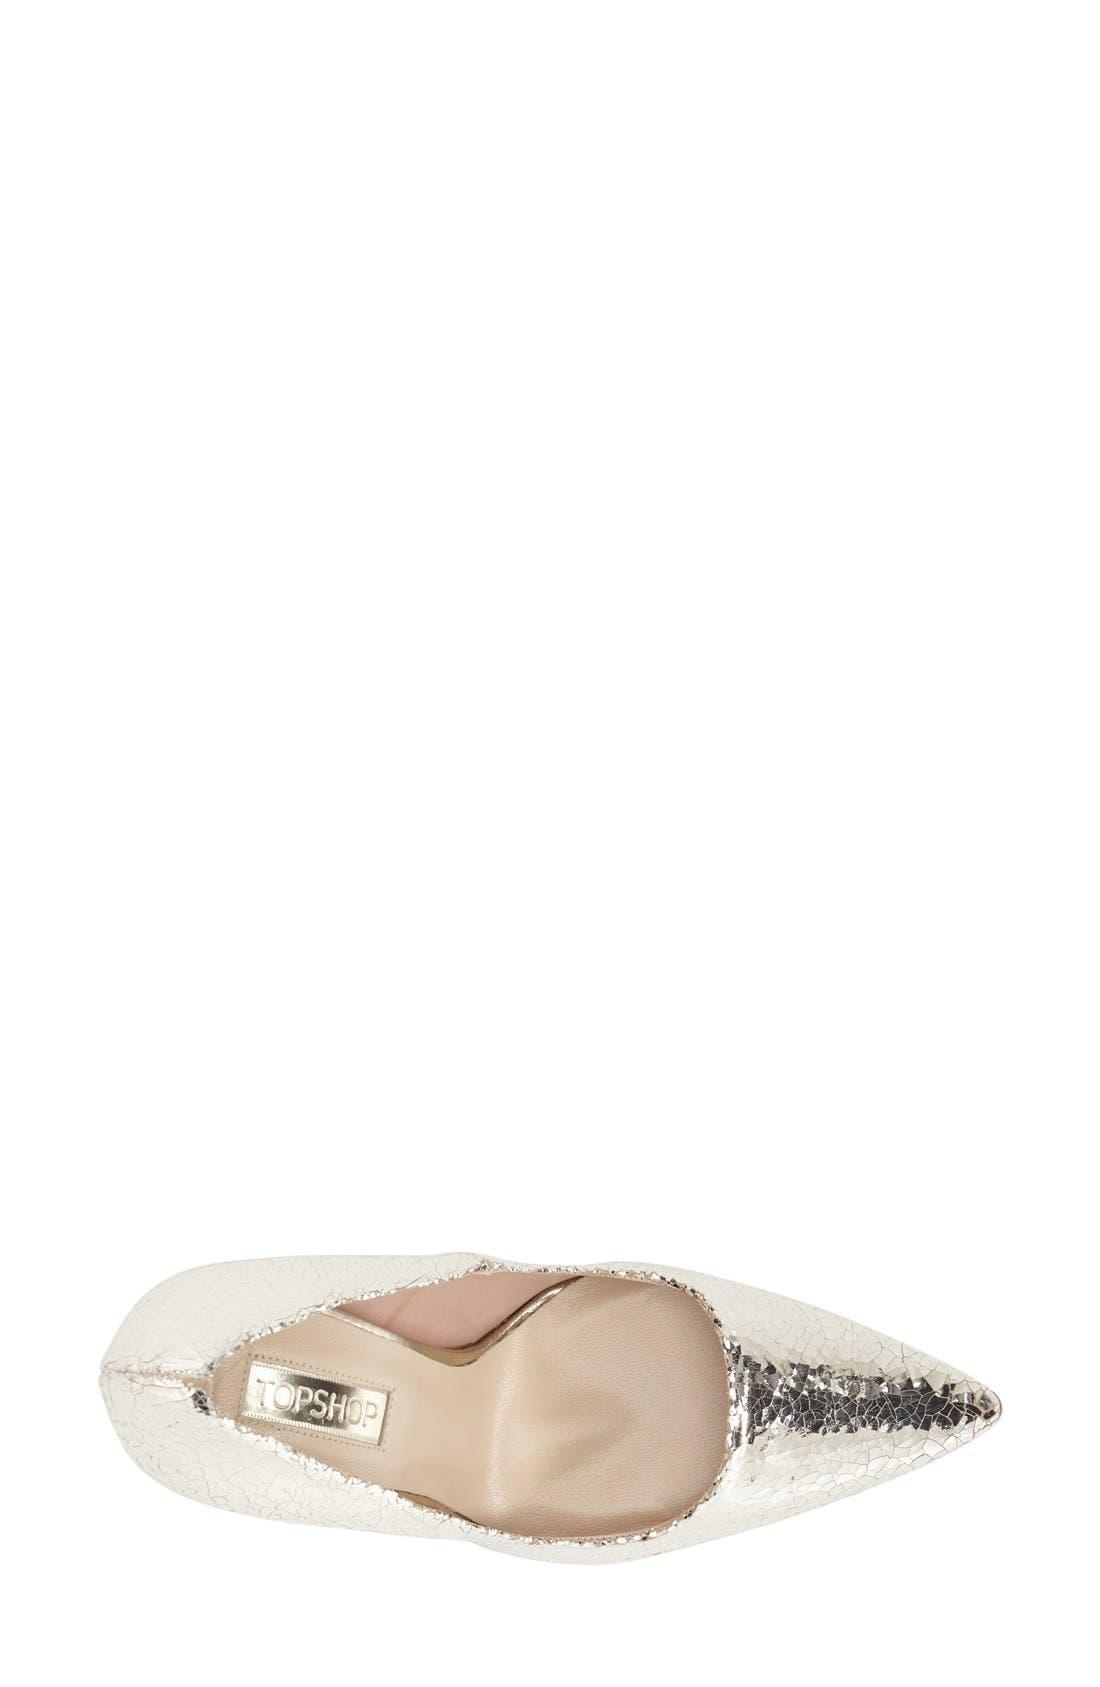 Alternate Image 3  - Topshop 'Gallop' Patent Pointy Toe Pump (Women)